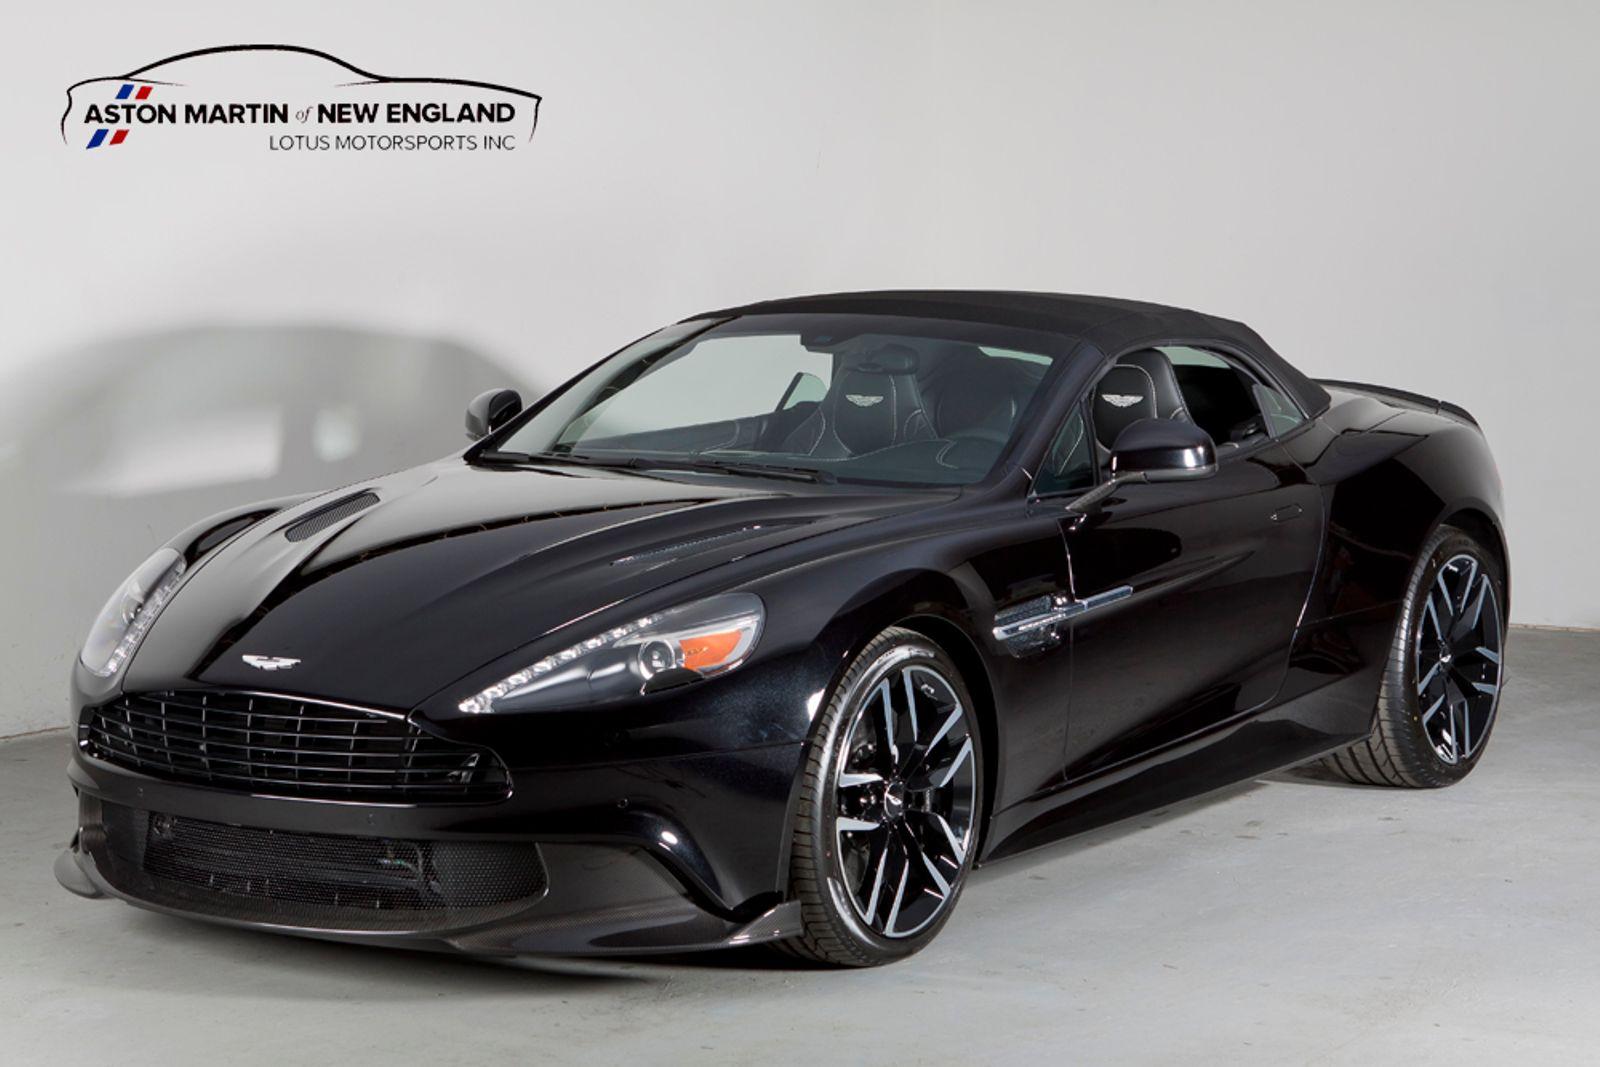 Aston Martin Vanquish S City MA Aston Martin Of New England - Aston martin new england